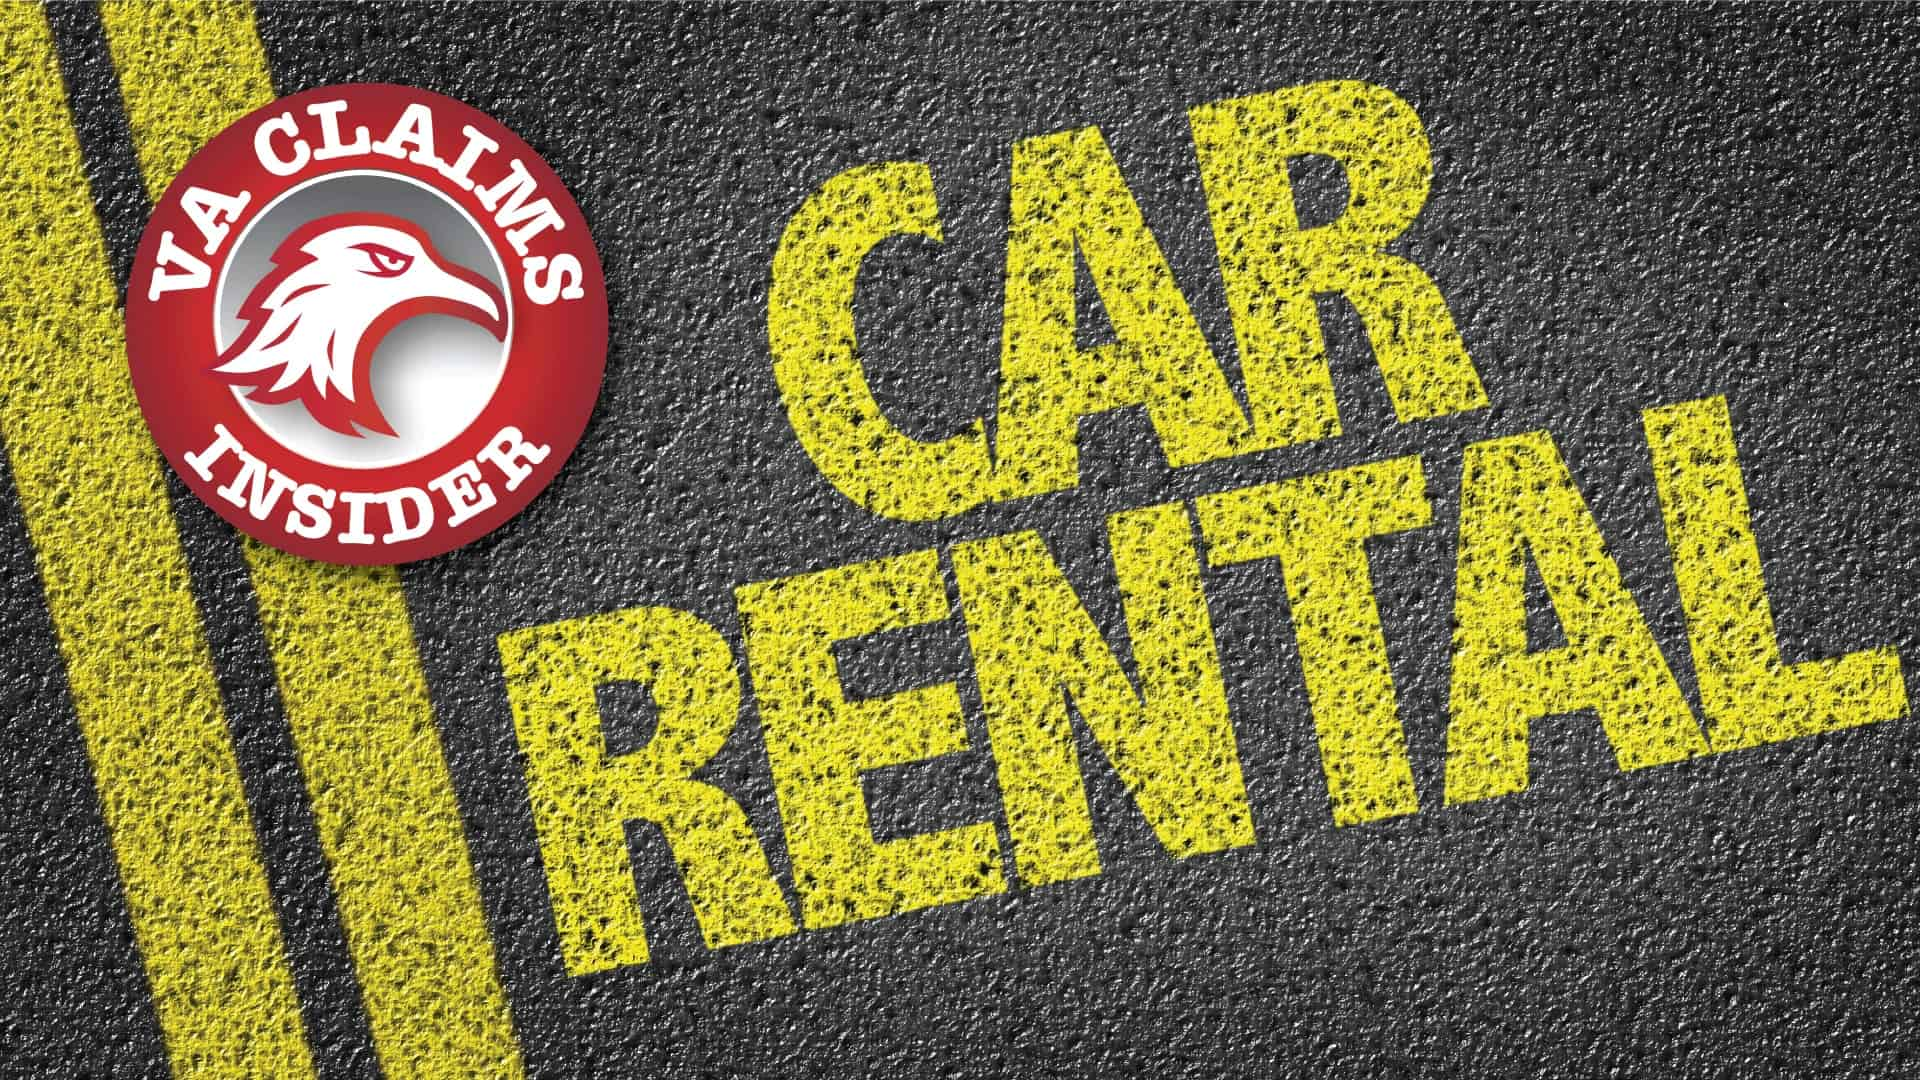 Car Rental Discounts for Veterans - VA Claims Insider